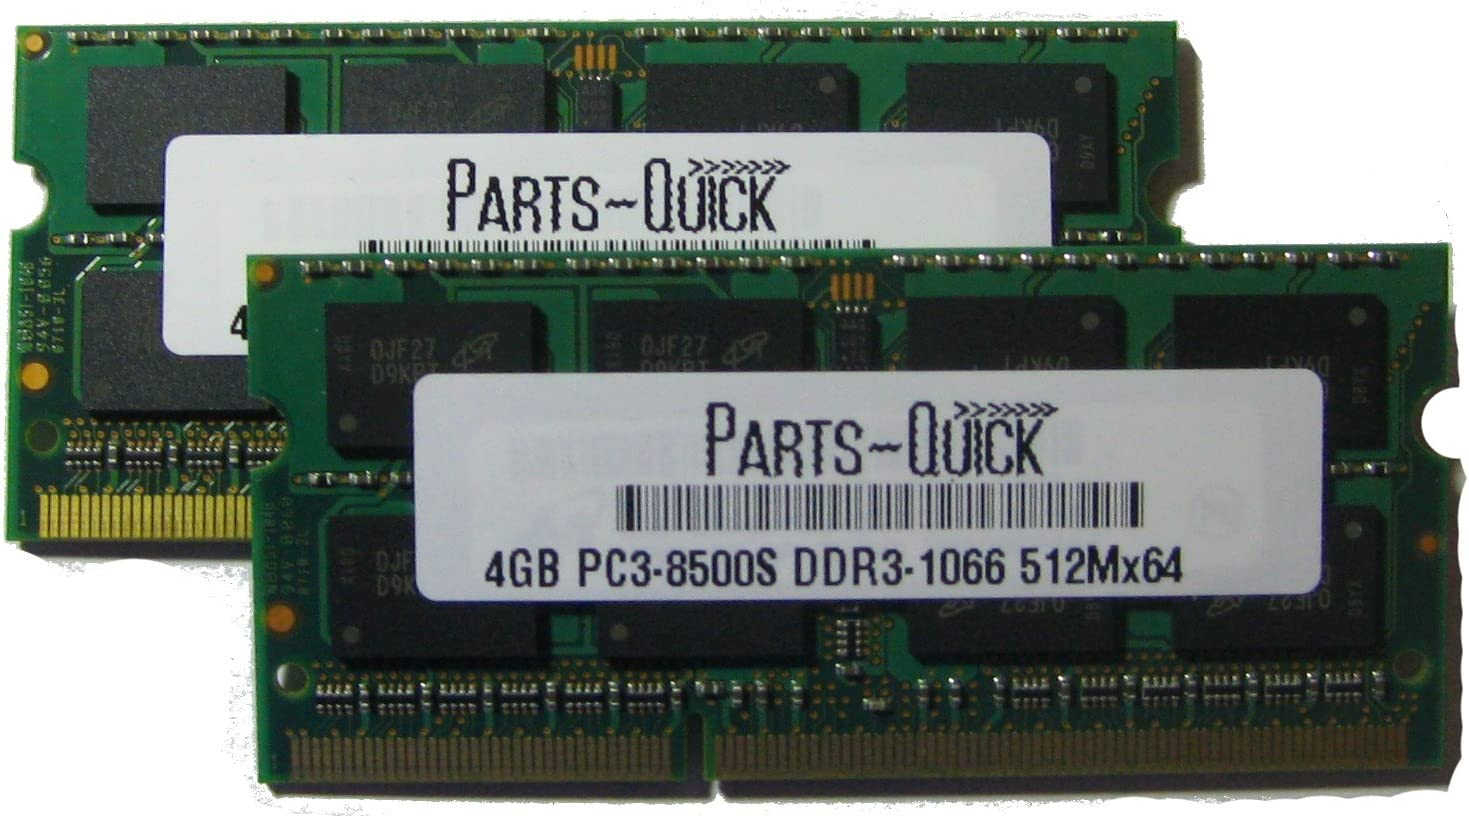 8GB 2x4GB 1066MHz PC3-8500 DDR3 SO-DIMM Memory RAM For Apple MacBook Pro Memory 13